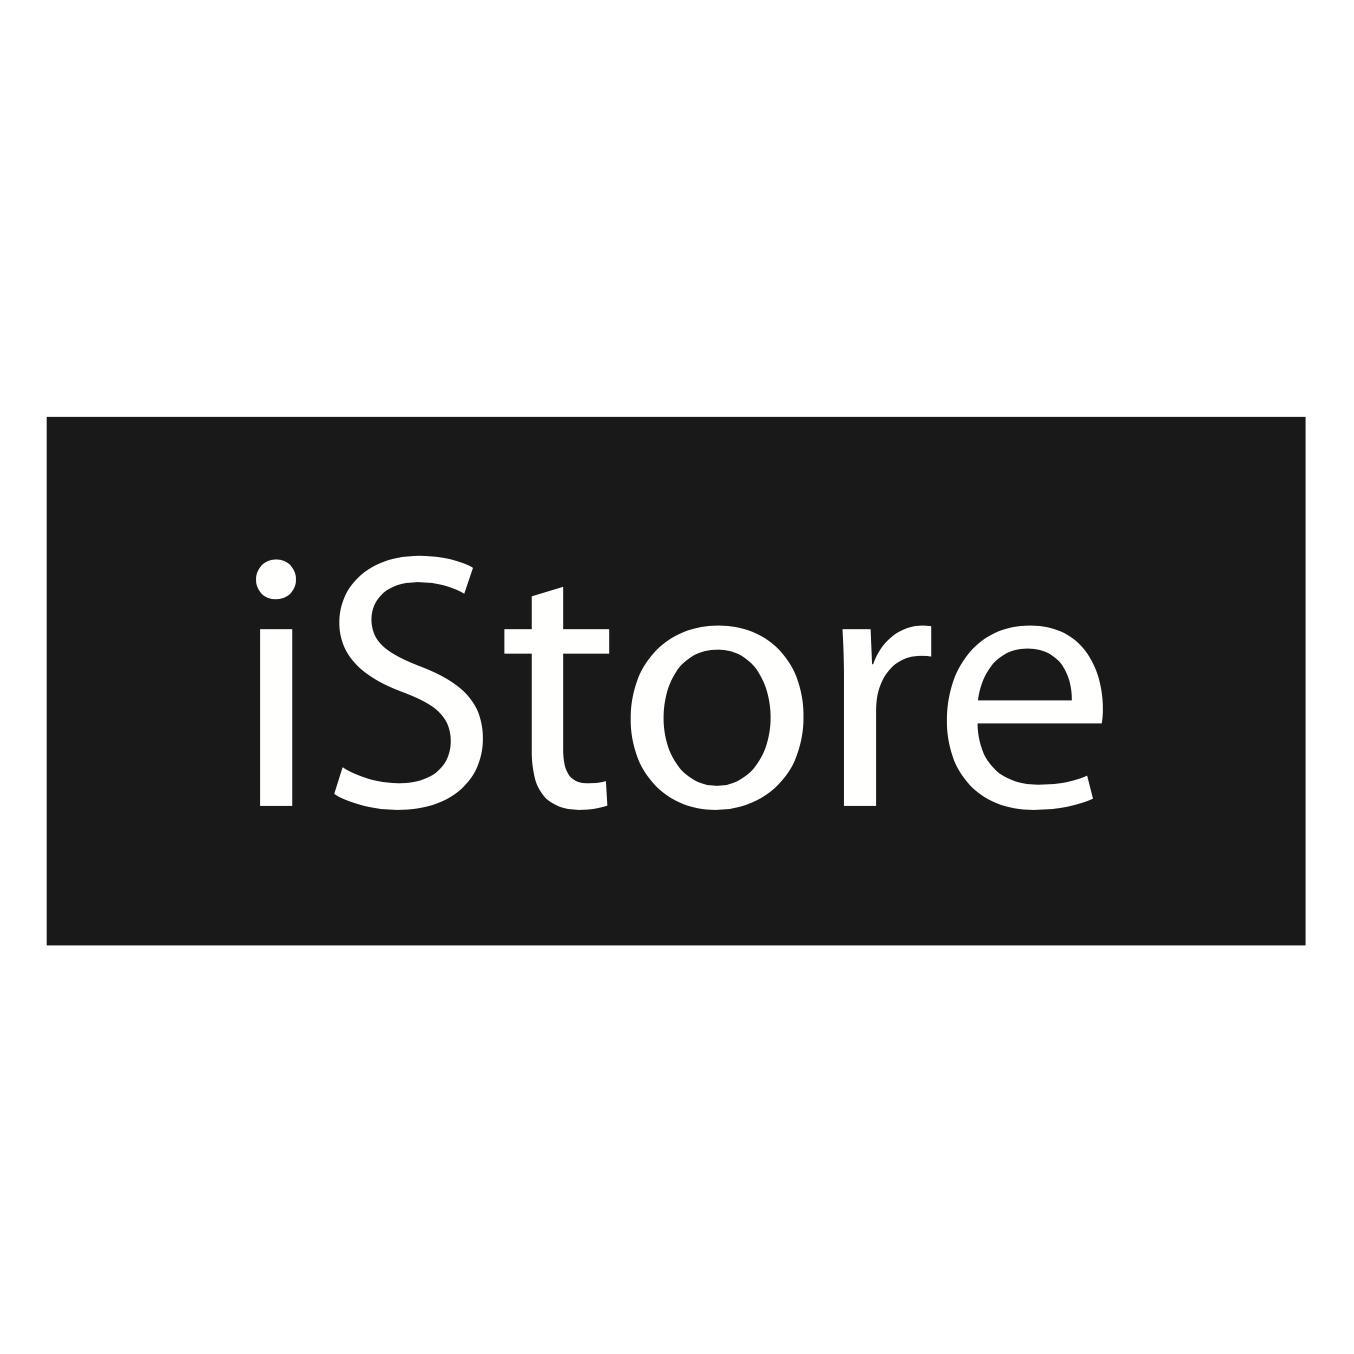 iPhone 8 / 7 Silicone Case - Dark Olive